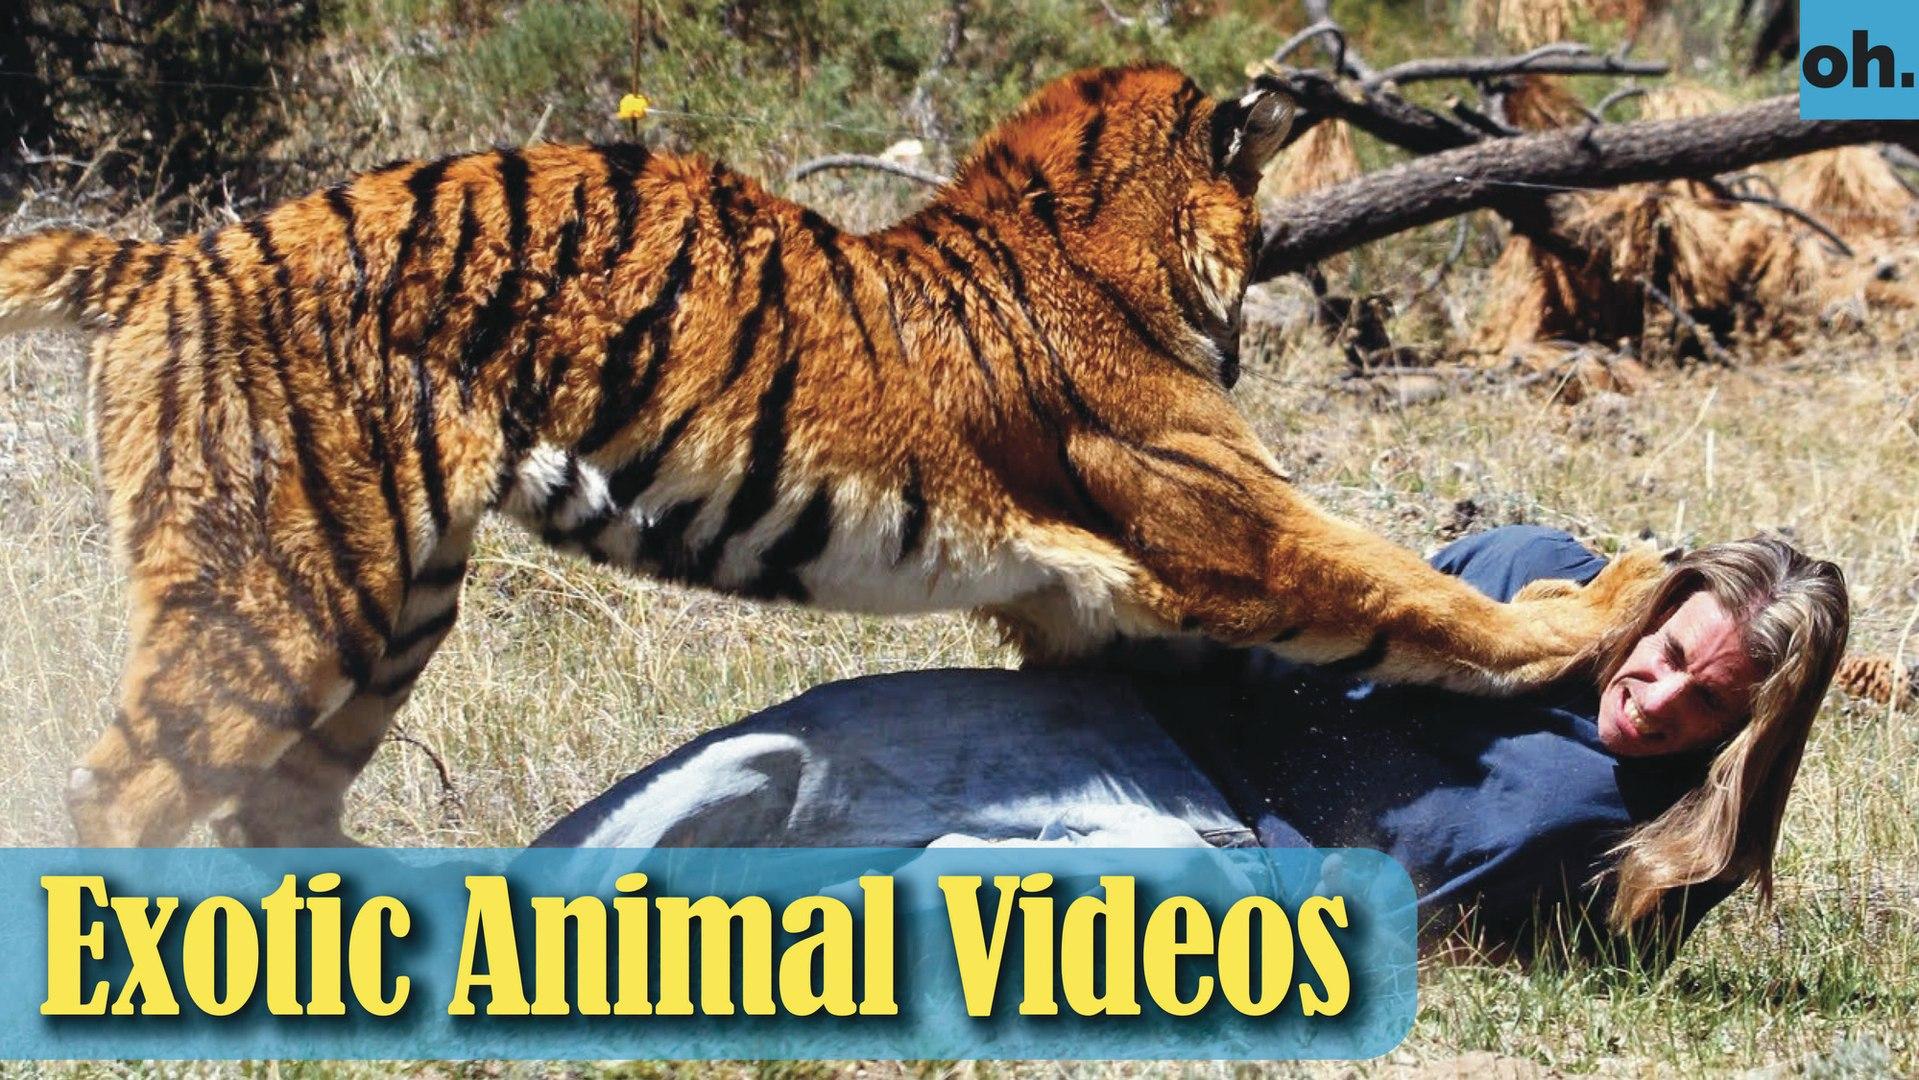 Animal Video - Endangered Animals - Extinct Animals - Rare Animals Zoo - Exotic Animals For Sale P3